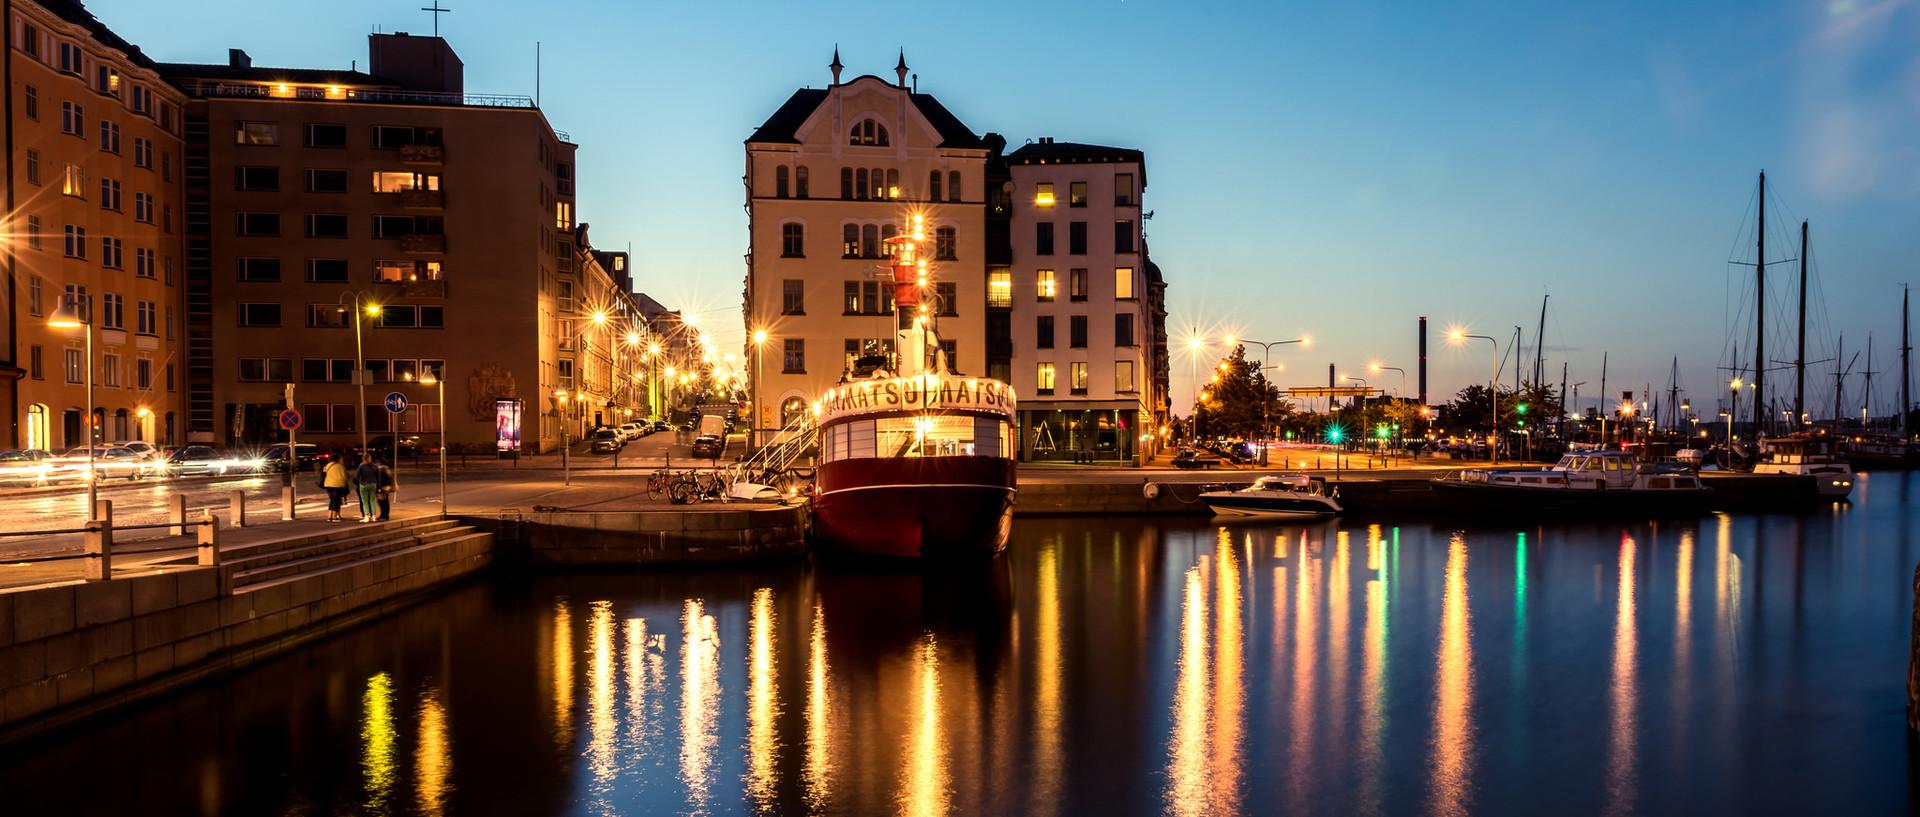 Expérience Erasmus à Helsinki, Finlande par Karen